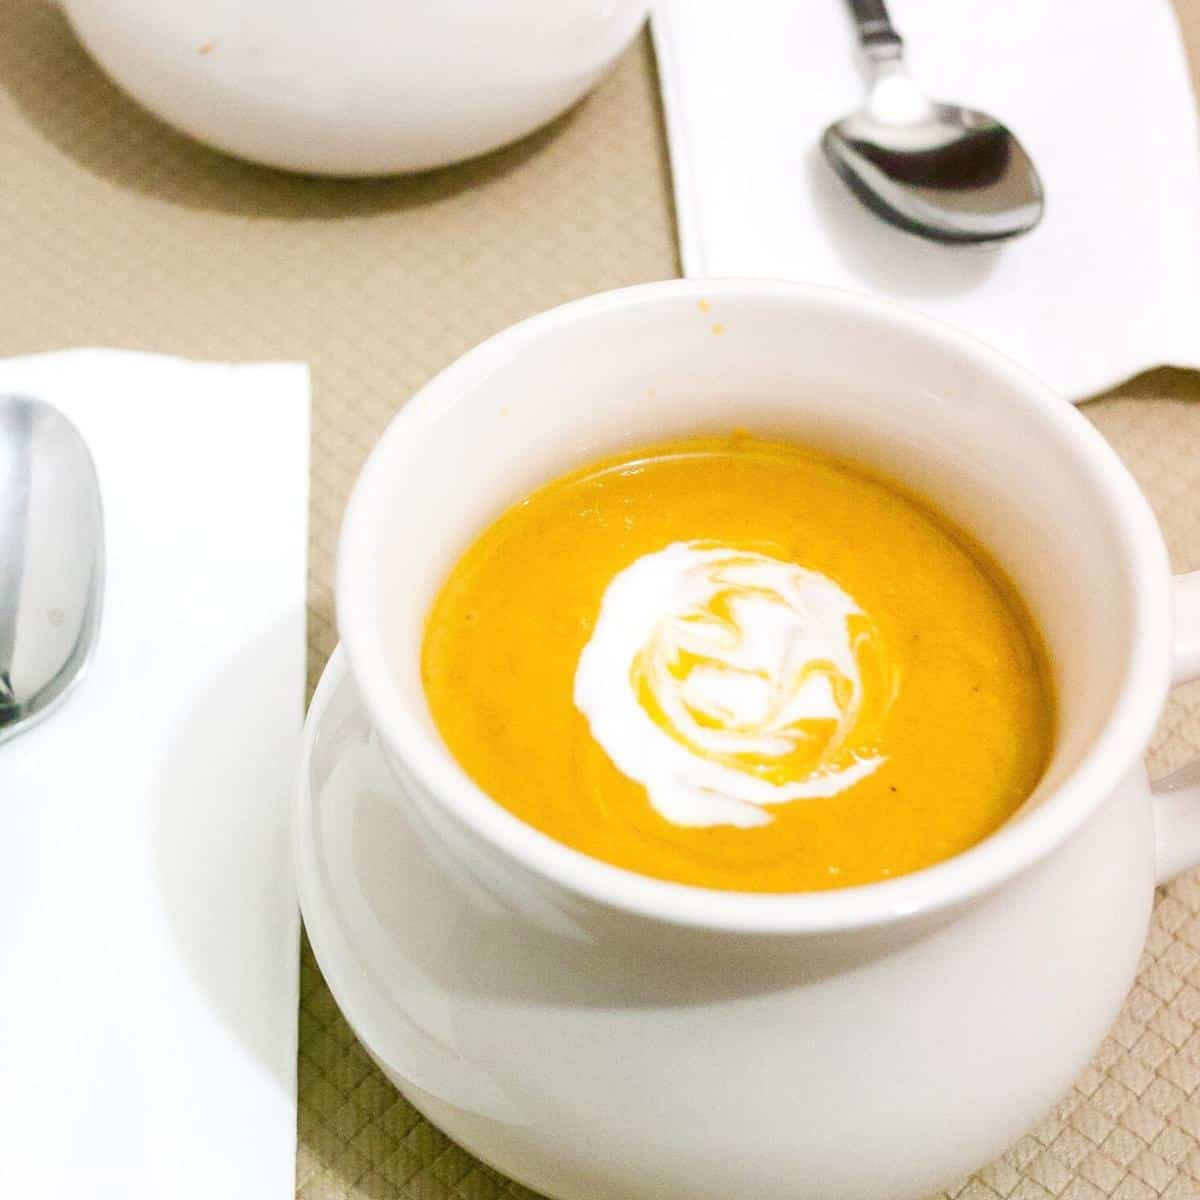 How to make a homemade soup with roasted pumpkin and sweet potato